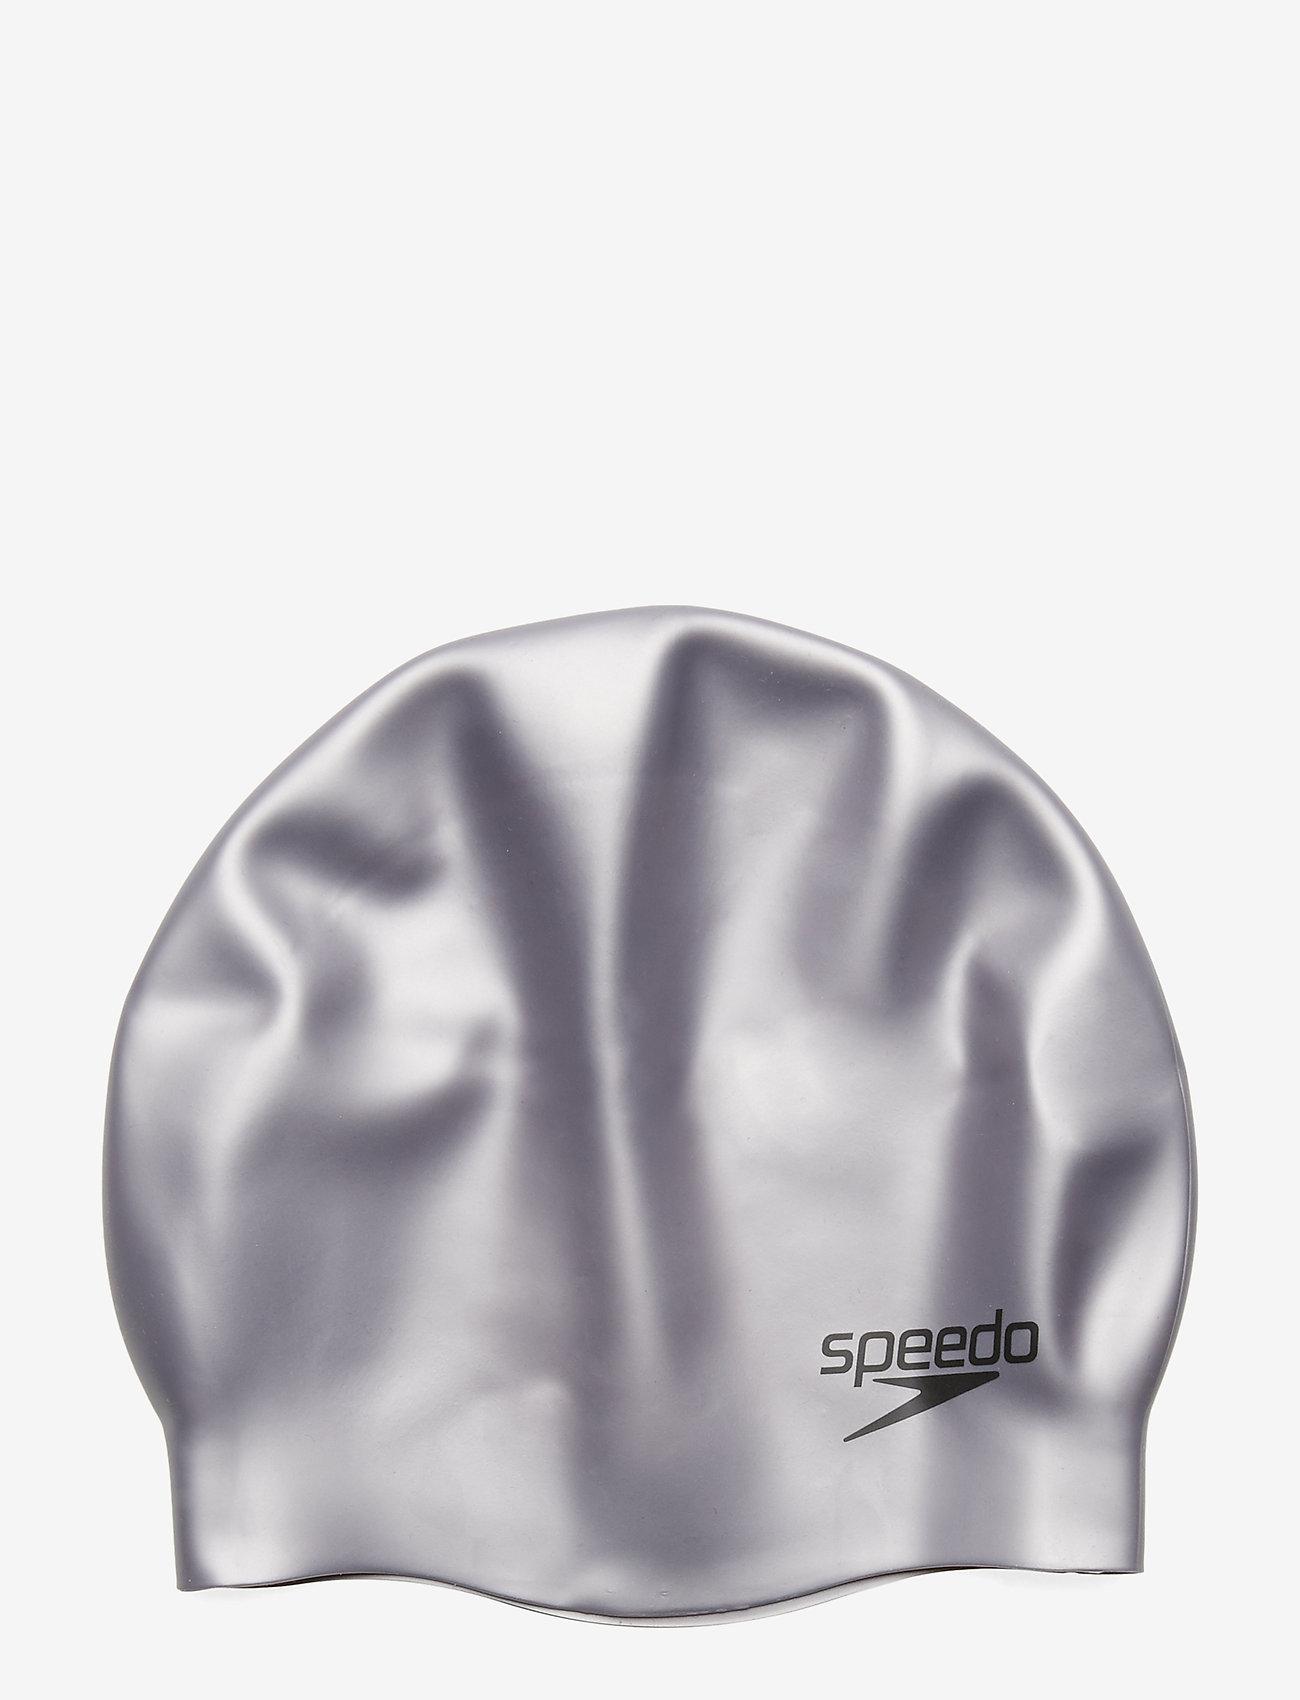 Speedo - SPEEDO SILICON MOULDED CAP AU, WHI MOP - annet - chrome - 1